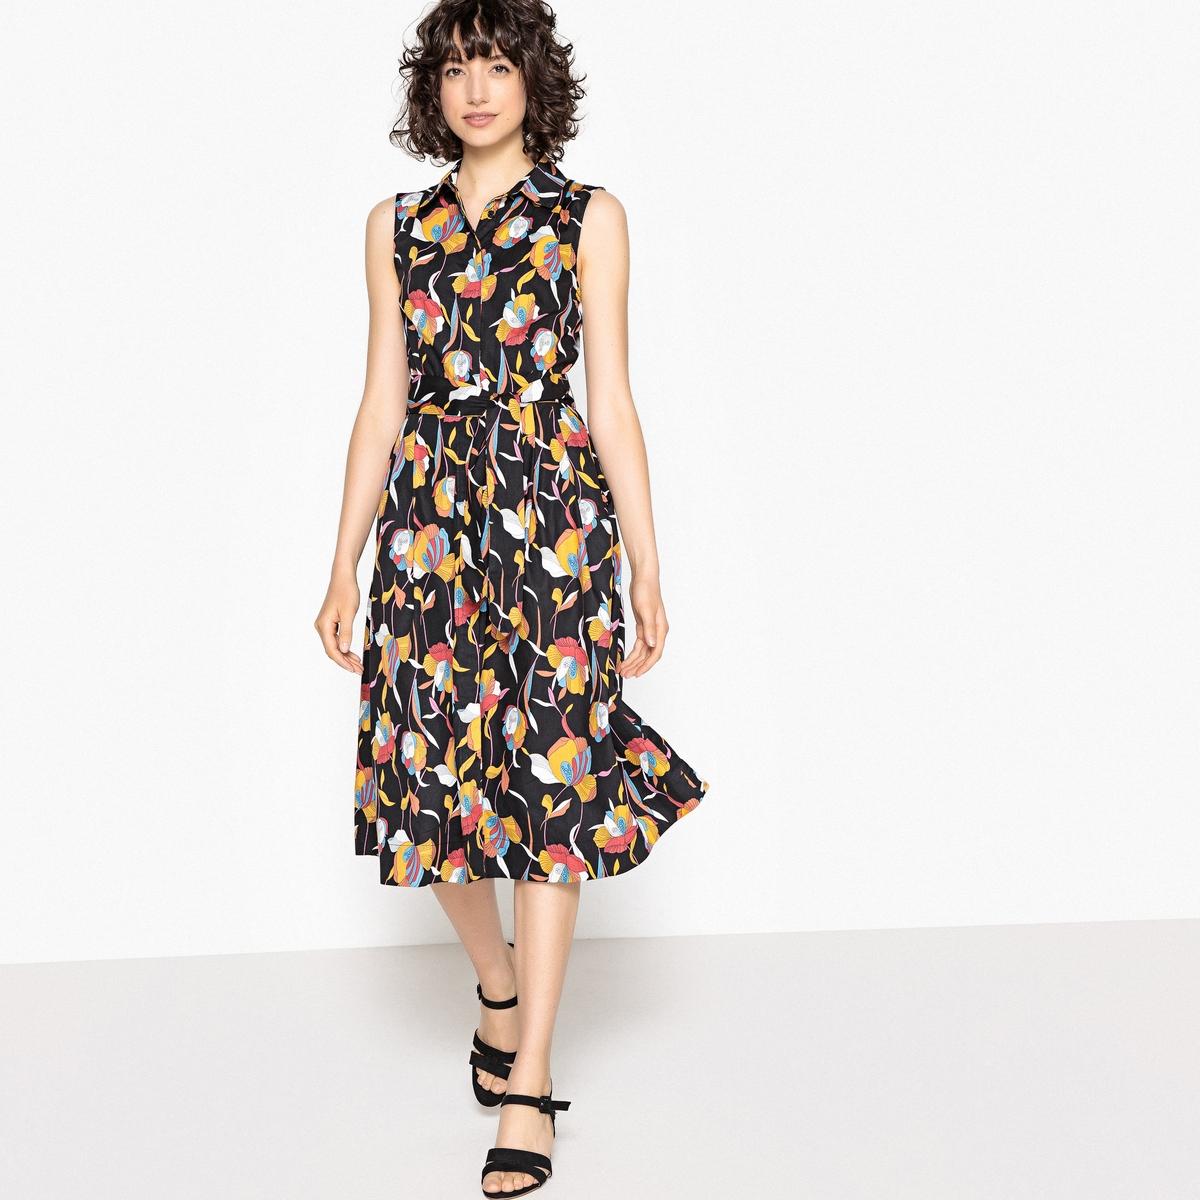 Платье-рубашка с рисунком, 100% хлопок